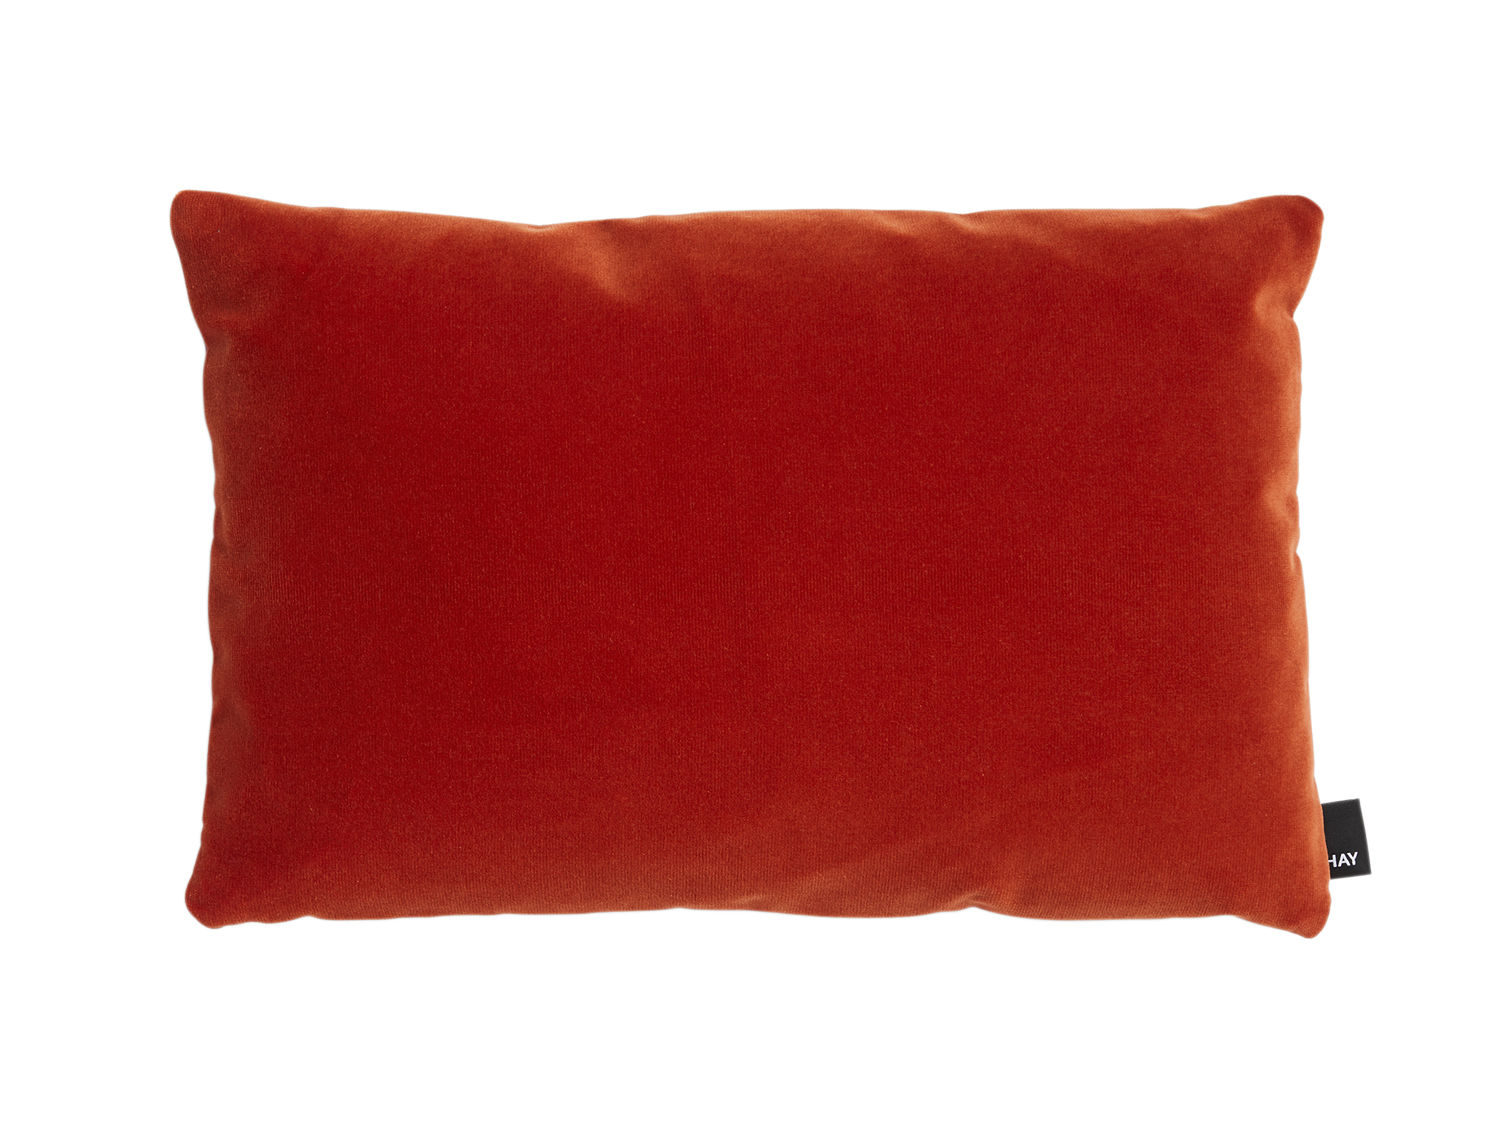 Dekoration - Kissen - Eclectic Kissen / 45 x 30 cm - Hay - Rot -  Plumes, Velours, Wolle